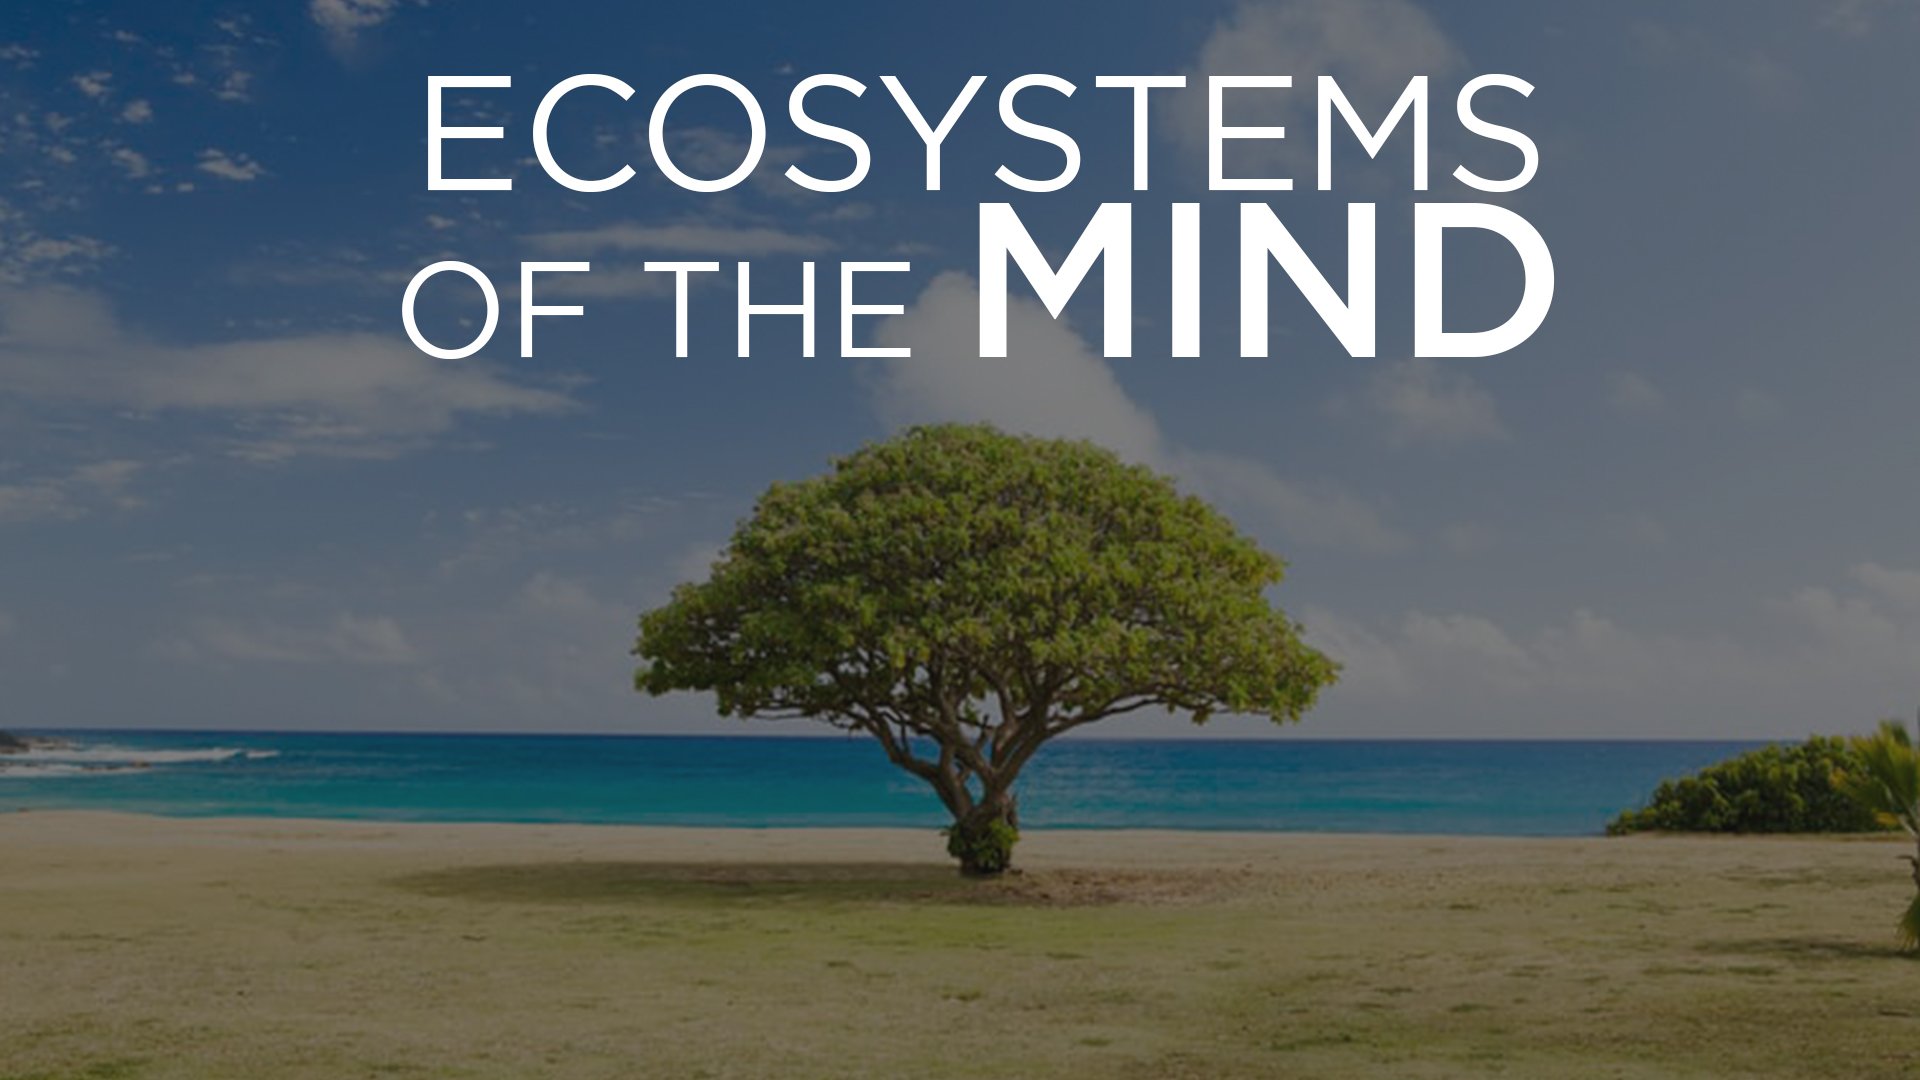 EcosystemsOfTheMind.jpg